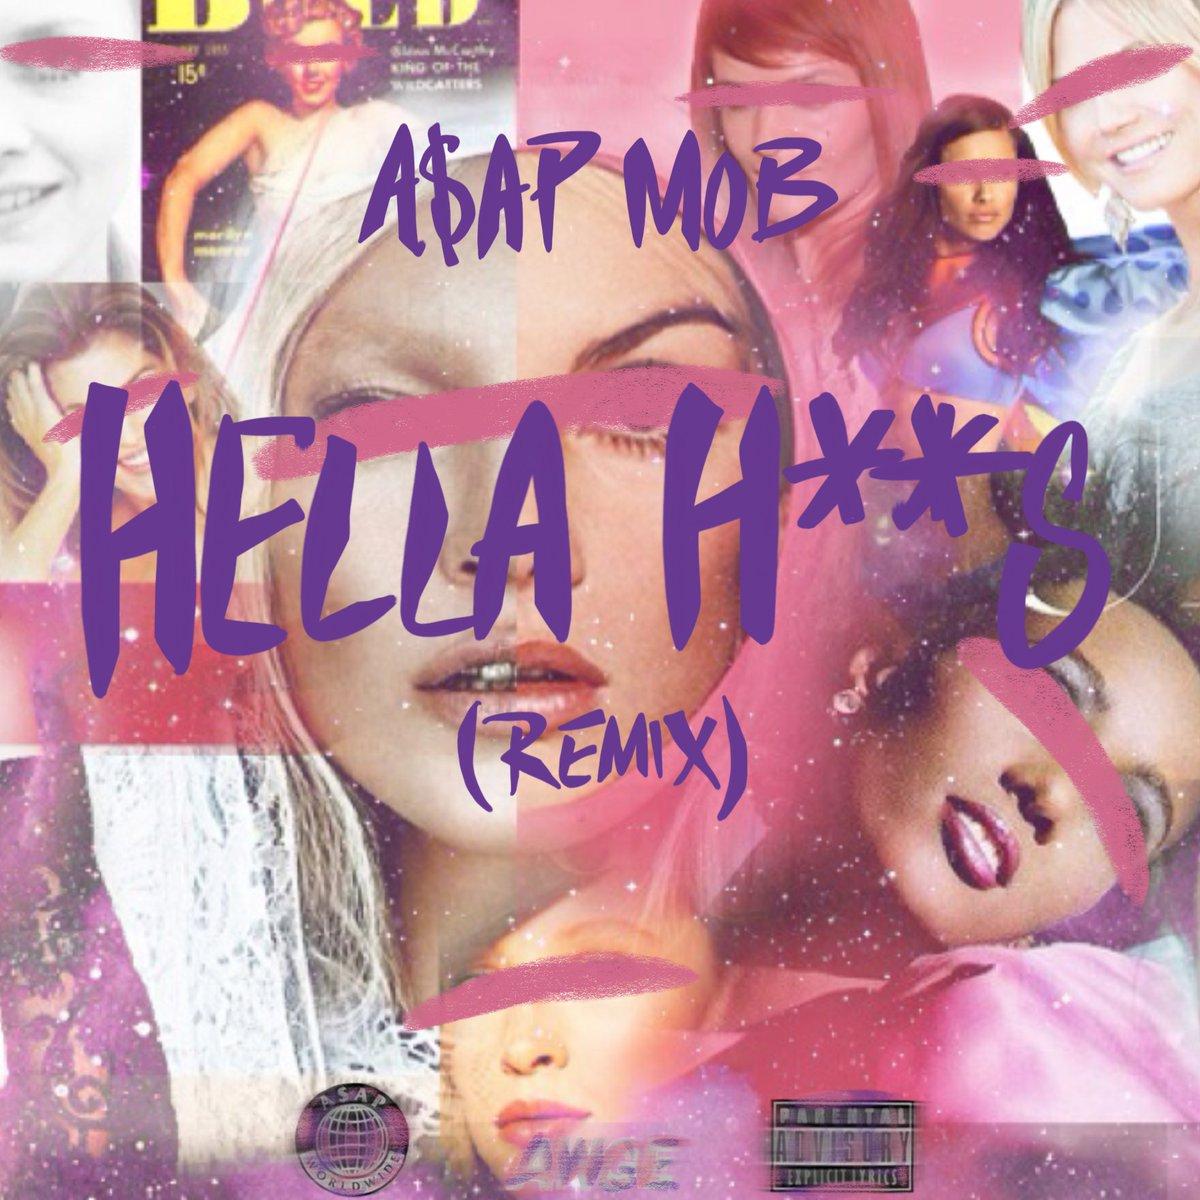 New Music: A$AP Mob x Aston Matthews x Danny Brown – Hella Hoes (Remix)